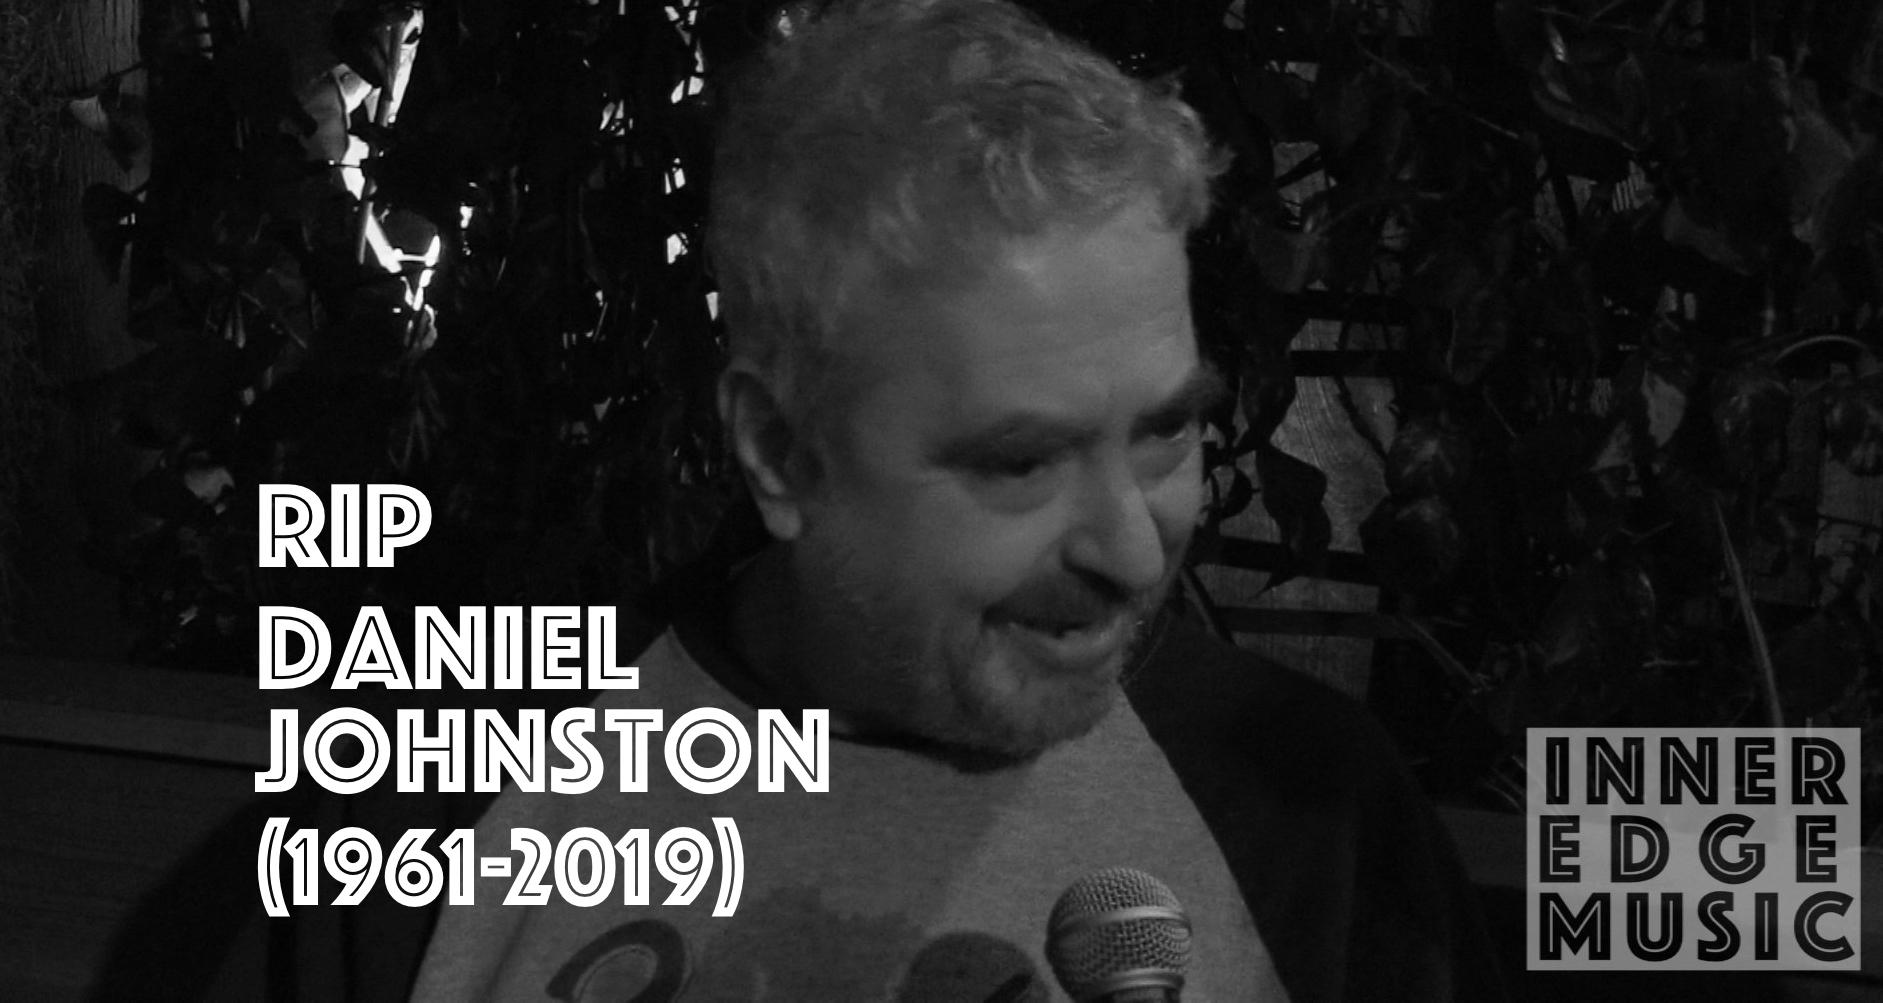 Daniel-Johnston RIP